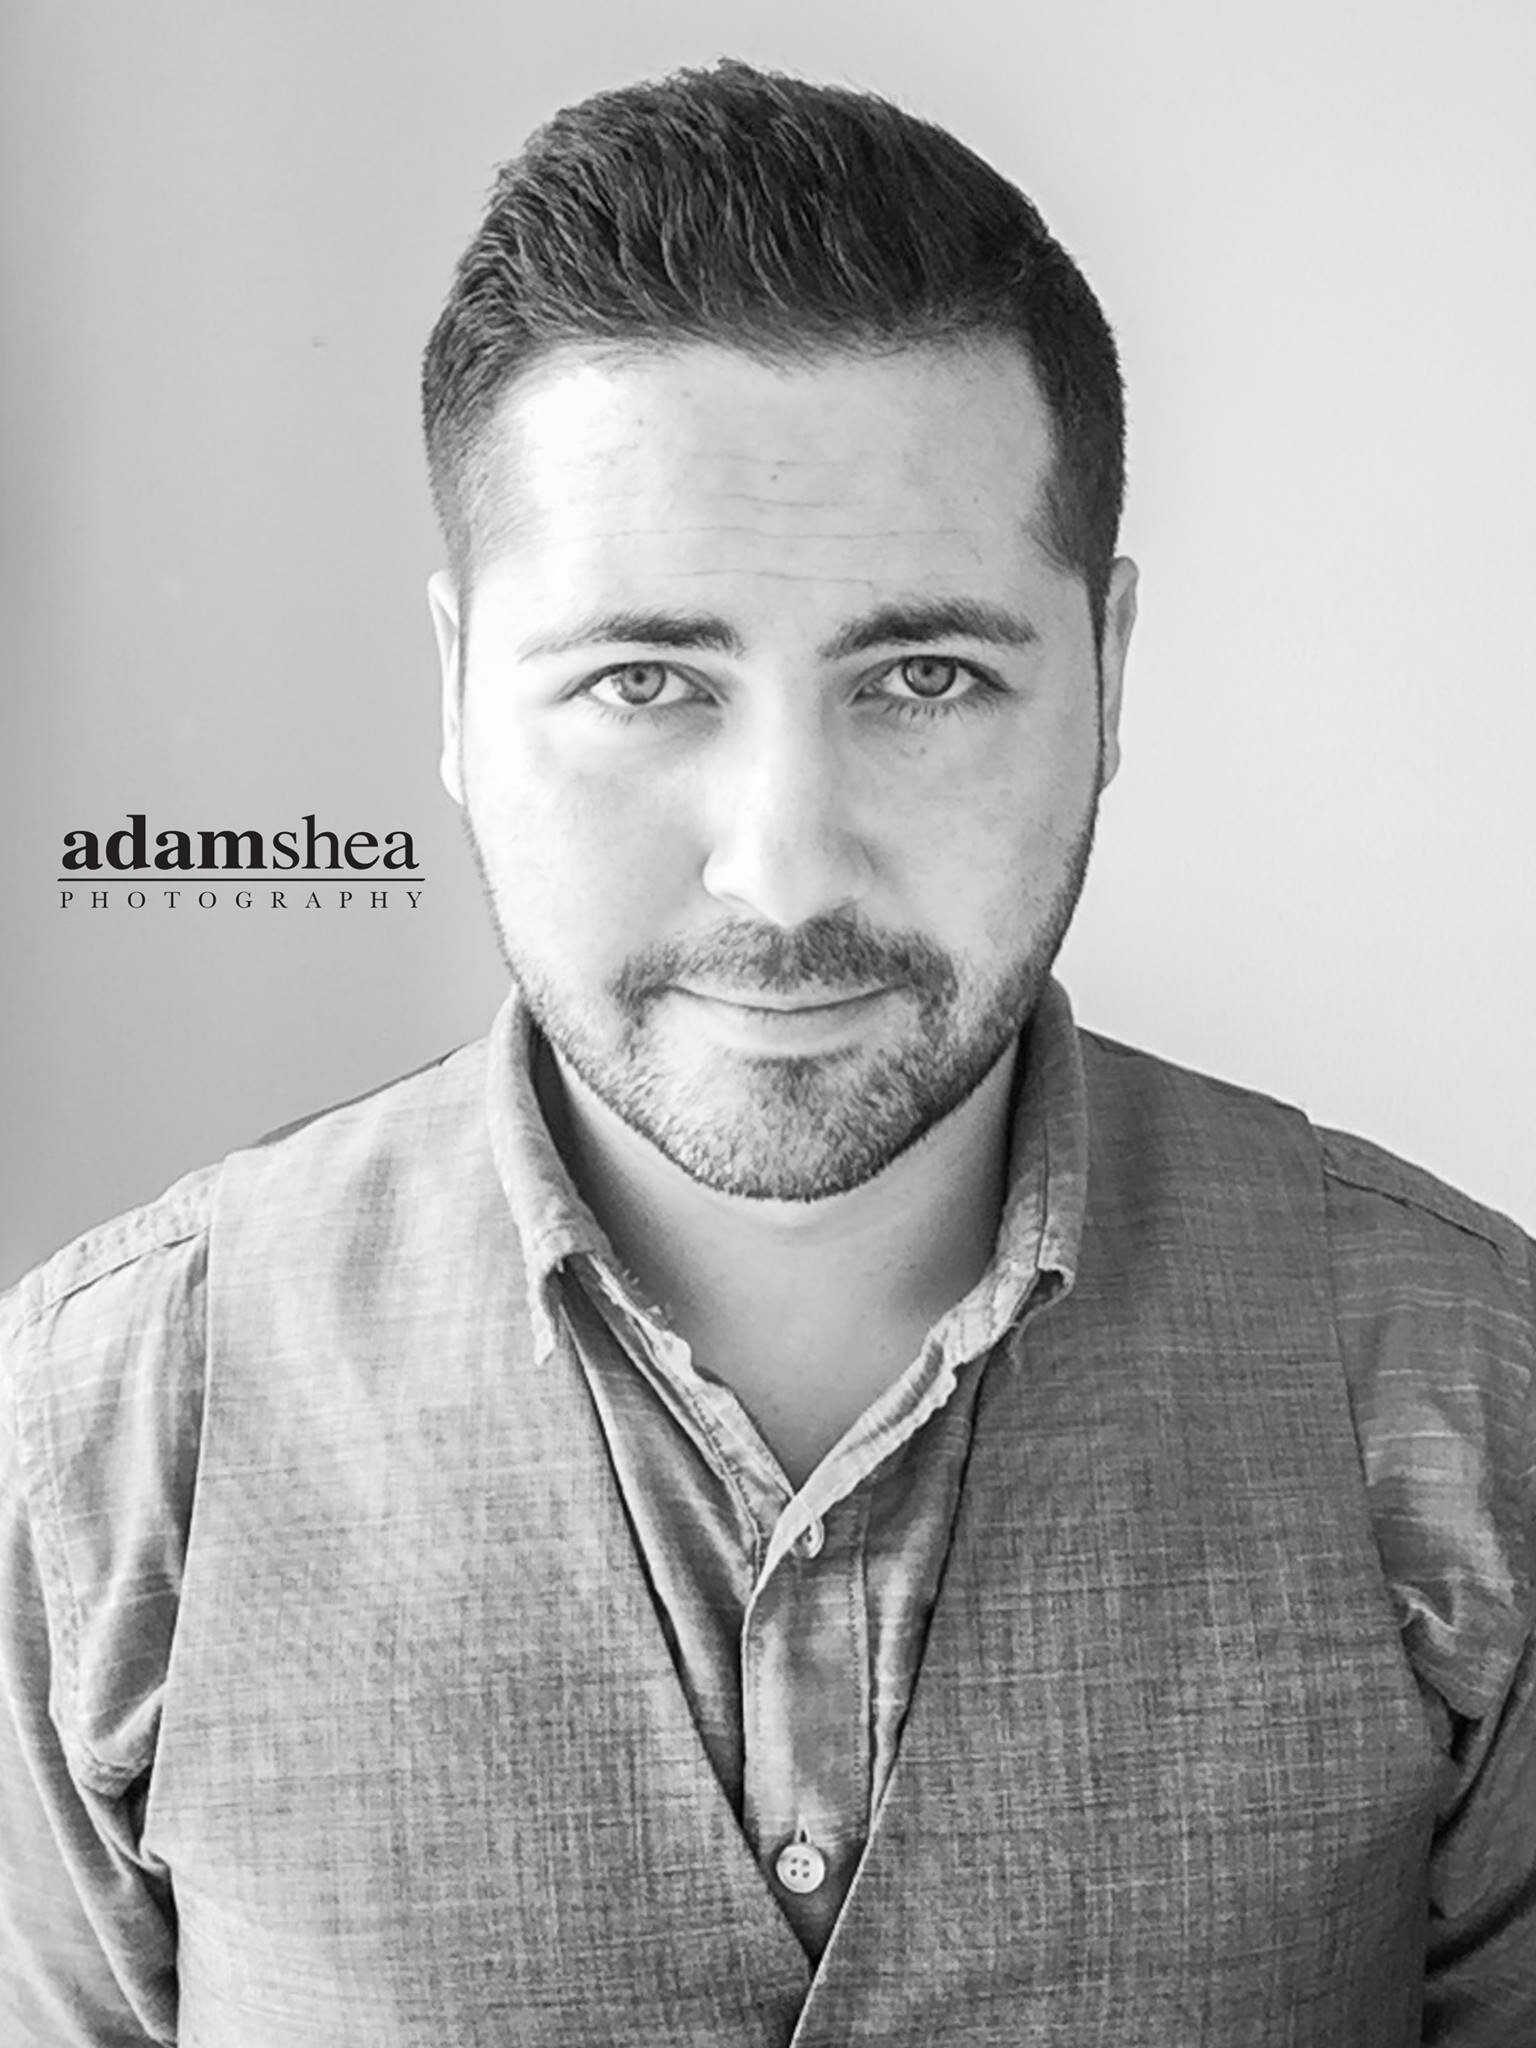 Adam-Shea-Photographer-Neenah-Green-Bay-Appleton-Wisconsin-Portait00003.jpg